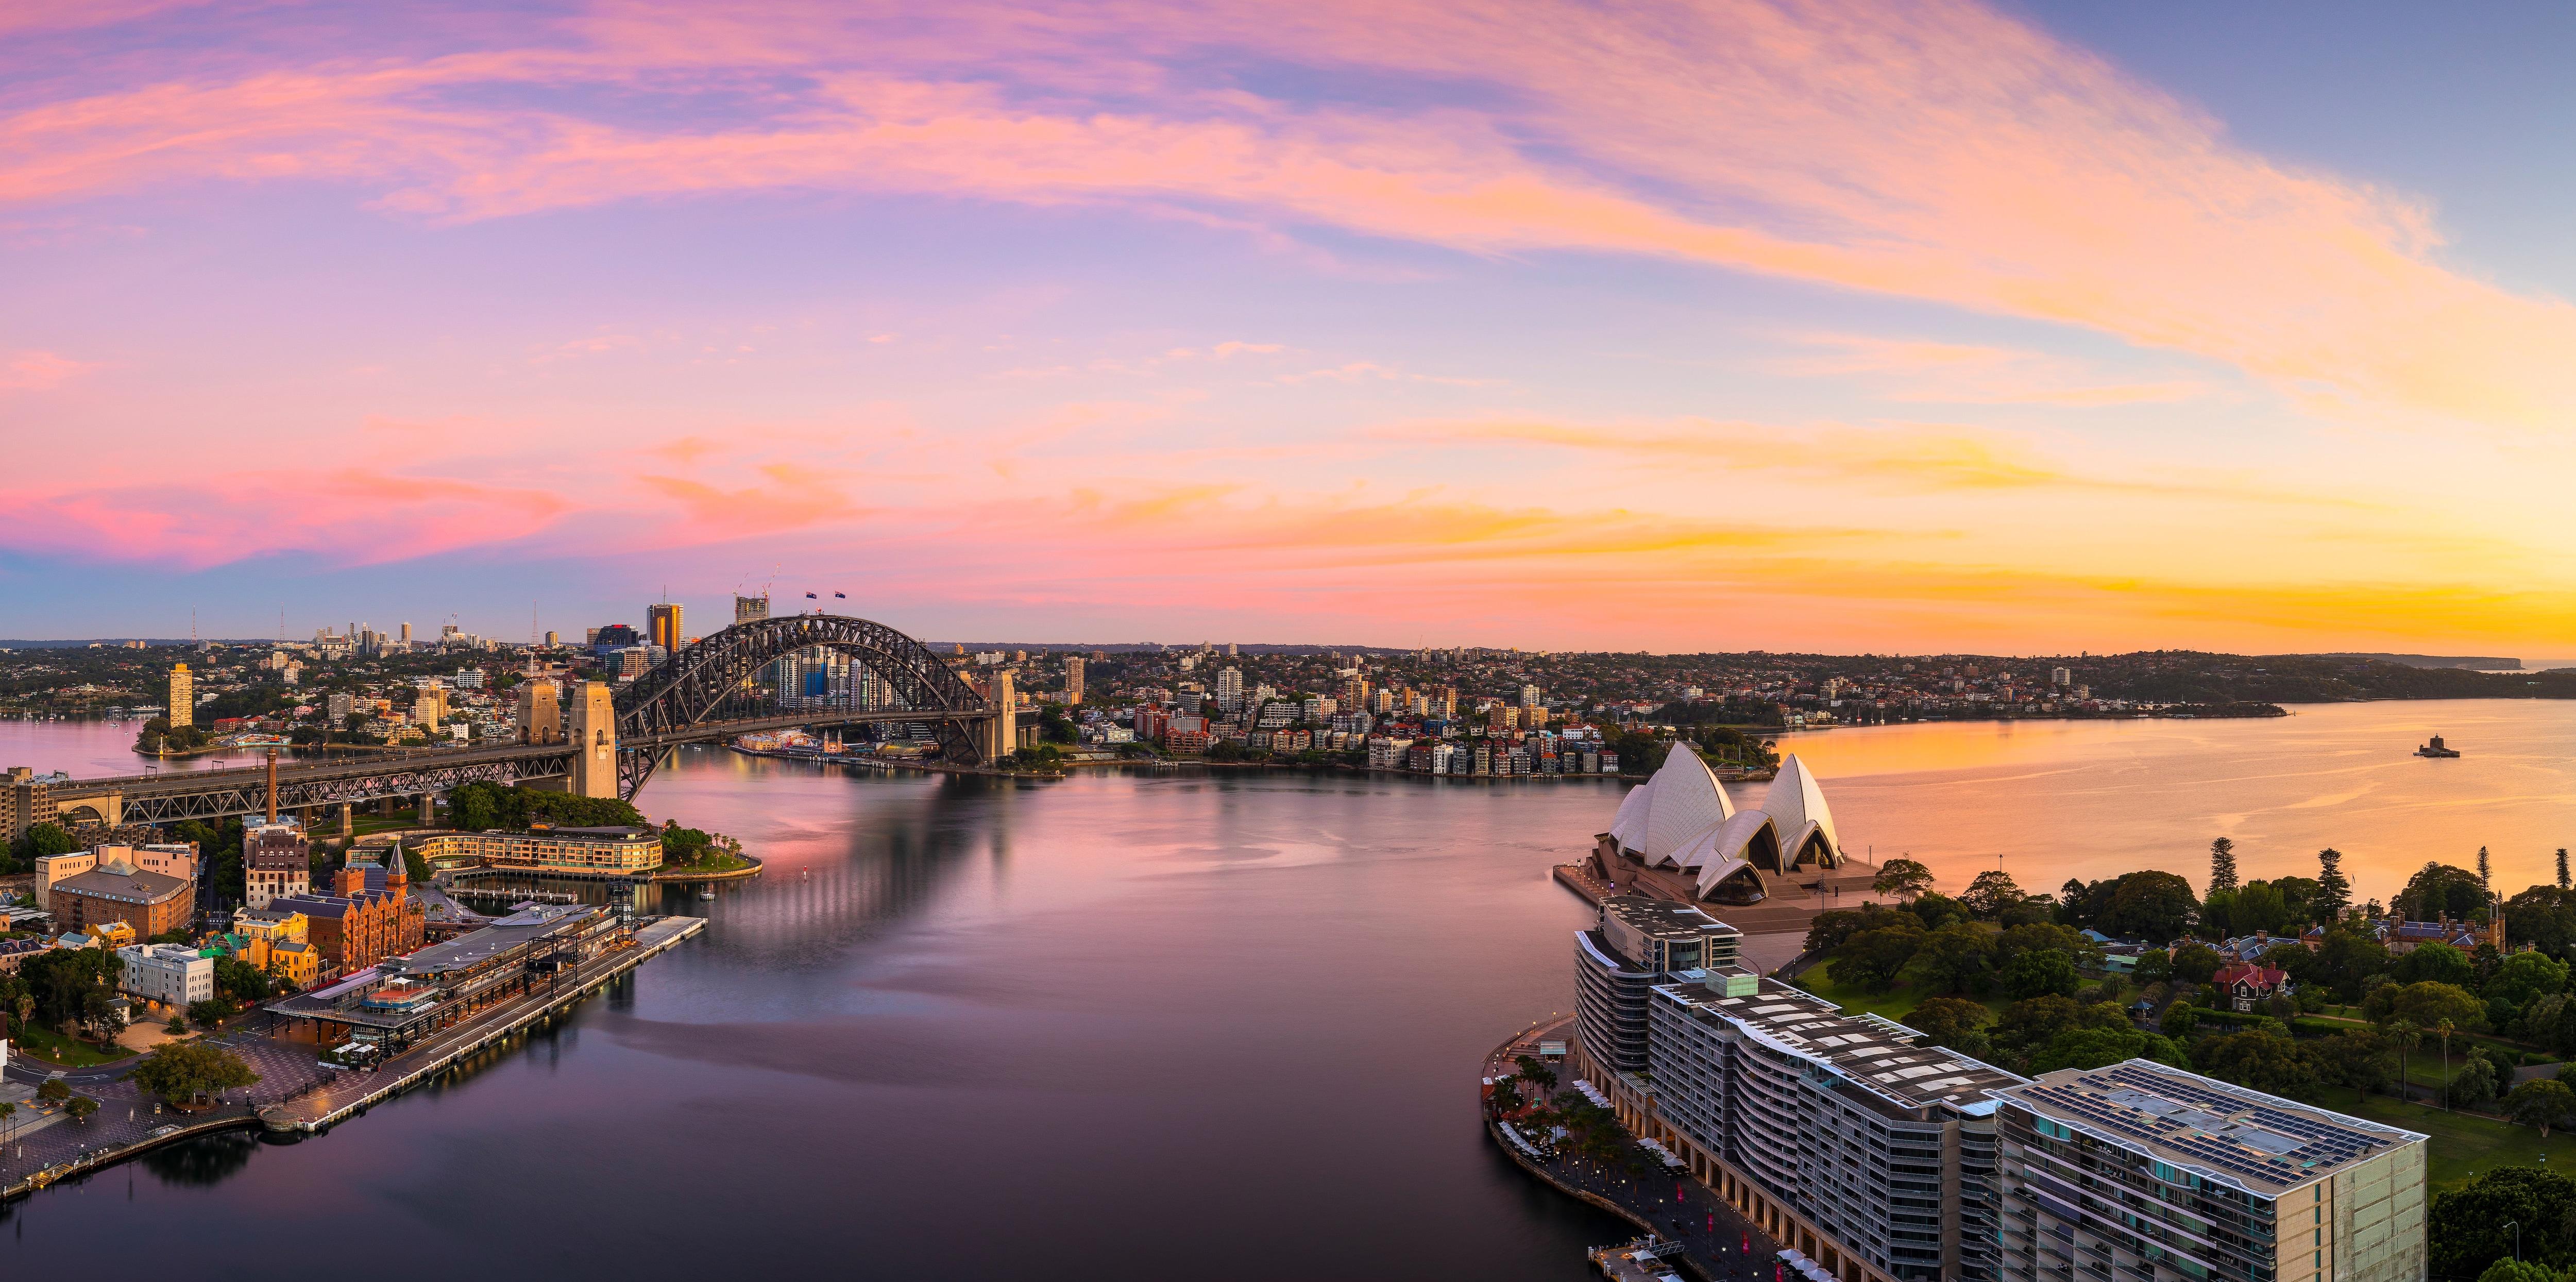 Muffa Bianca In Cantina 3 giorni a sydney - tourism australia